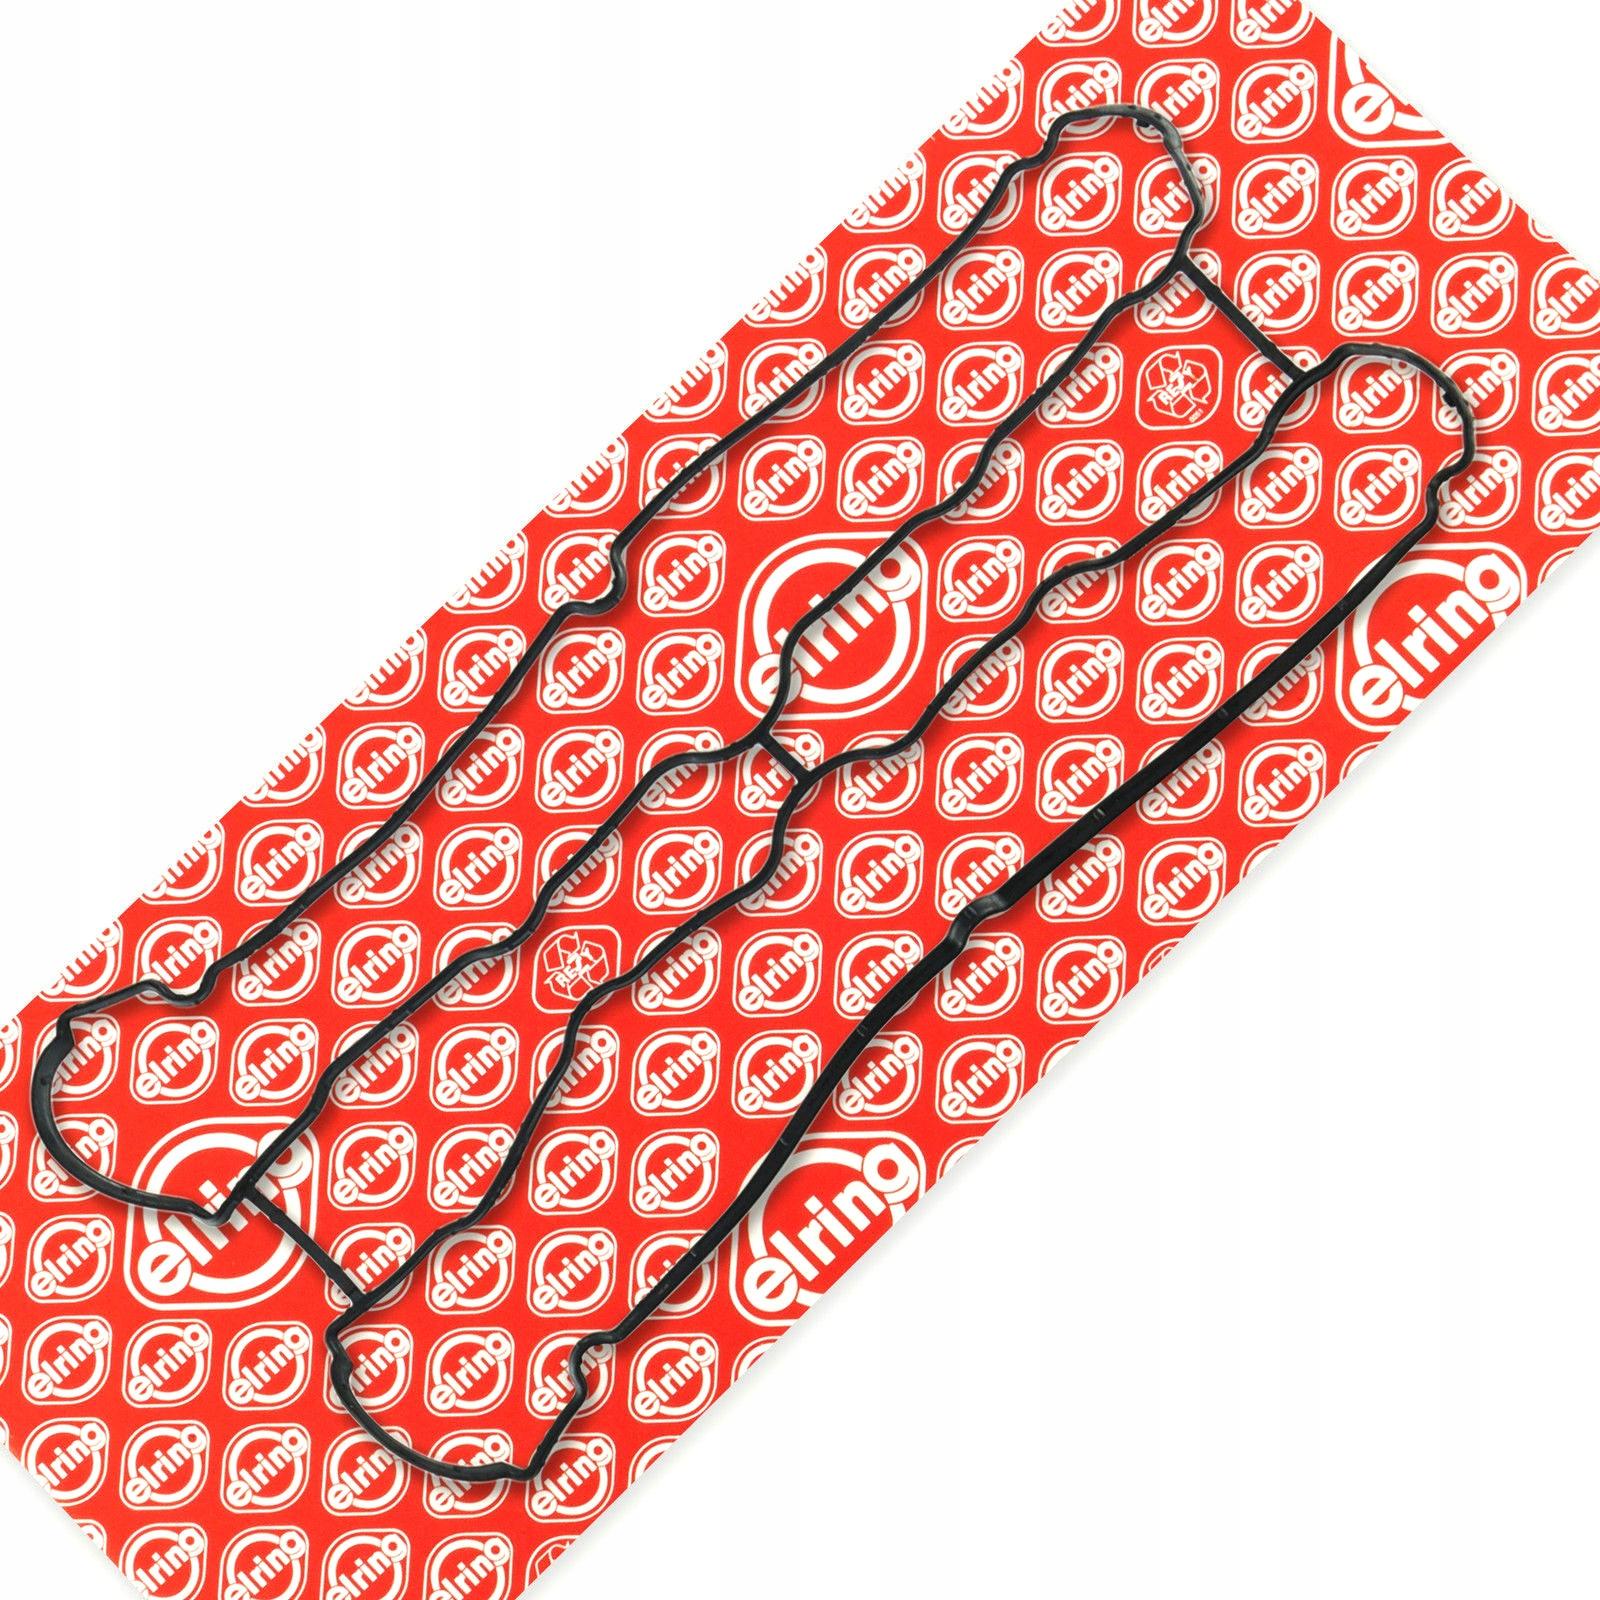 прокладка крышки клапанов opel astra g 14 16 16v